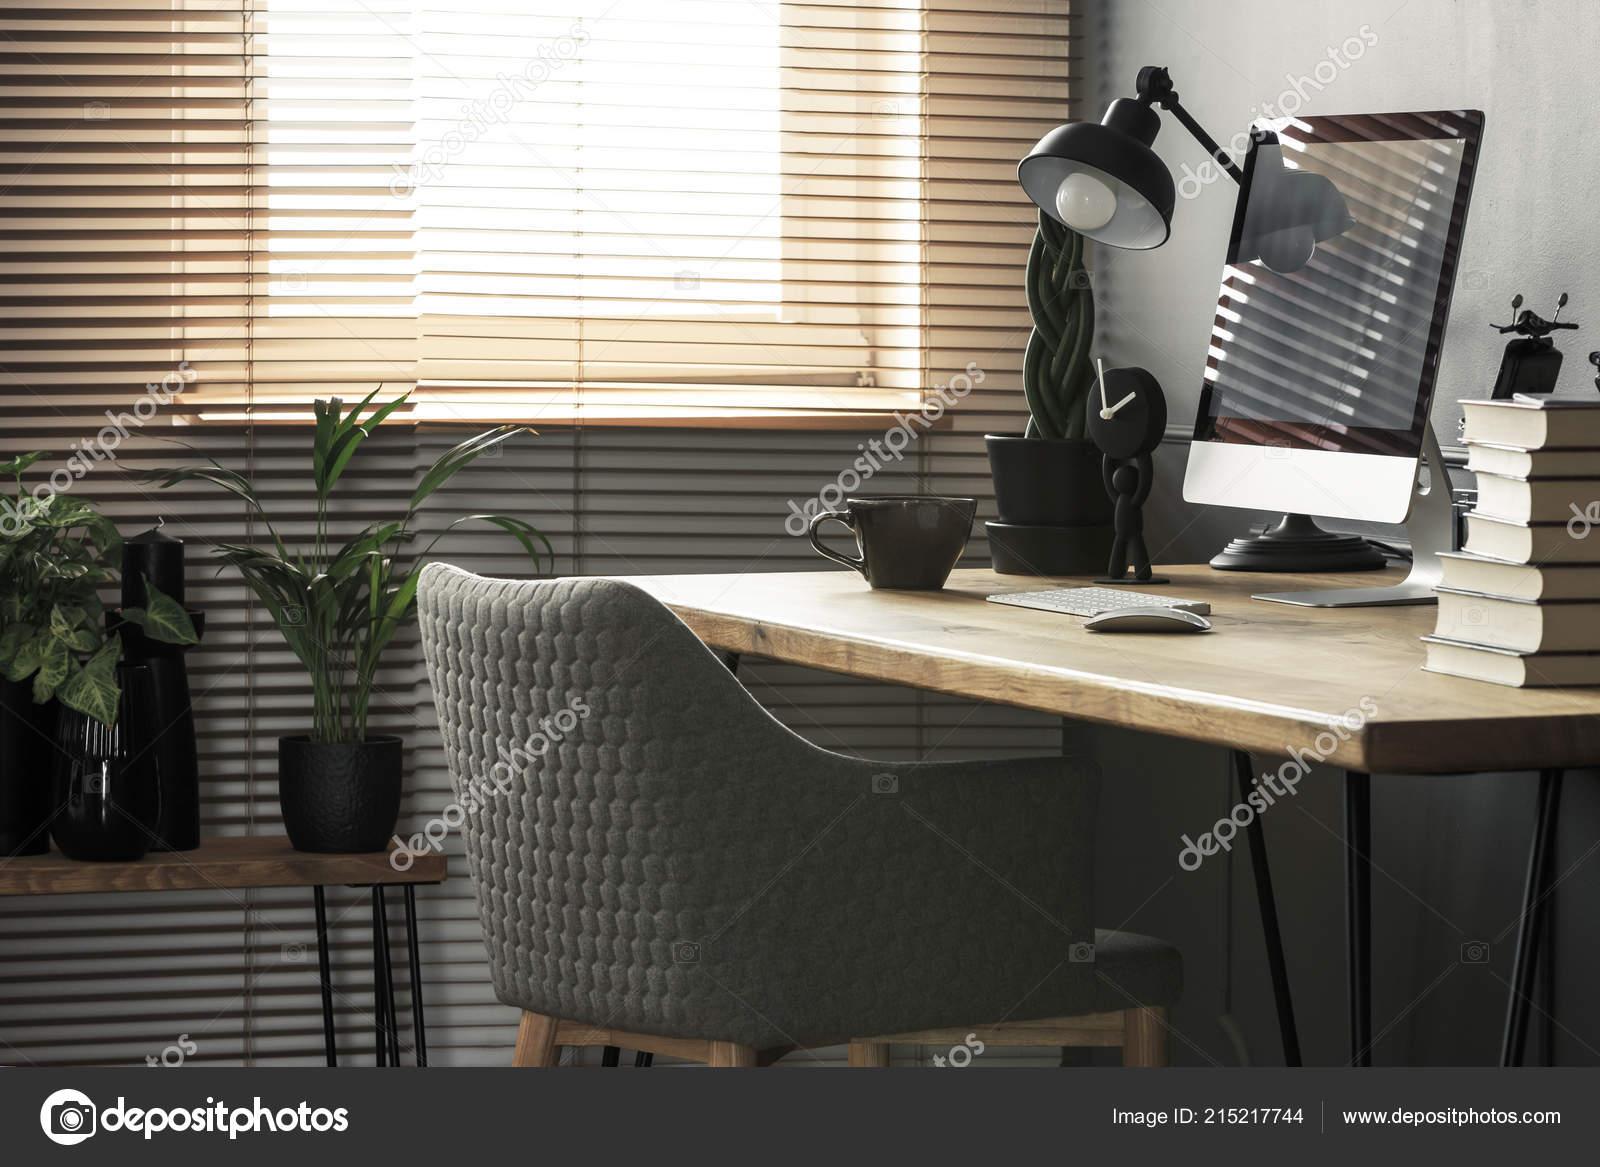 Grey Chair Wooden Desk Books Desktop Computer Bright